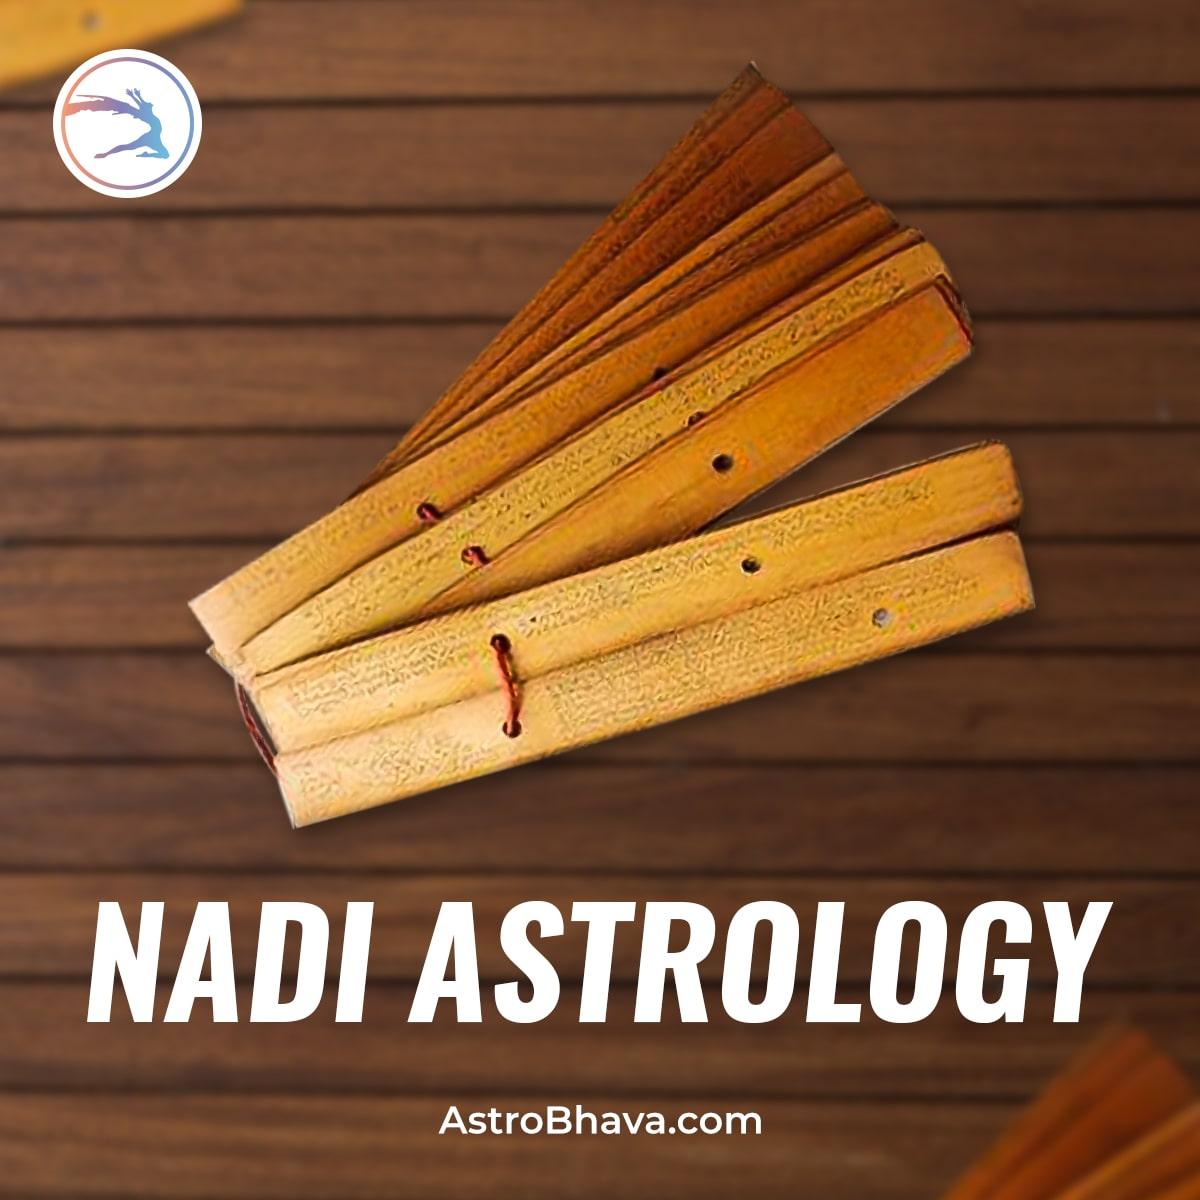 Unravel Destiny with AstroBhava's Nadi Astrology Services